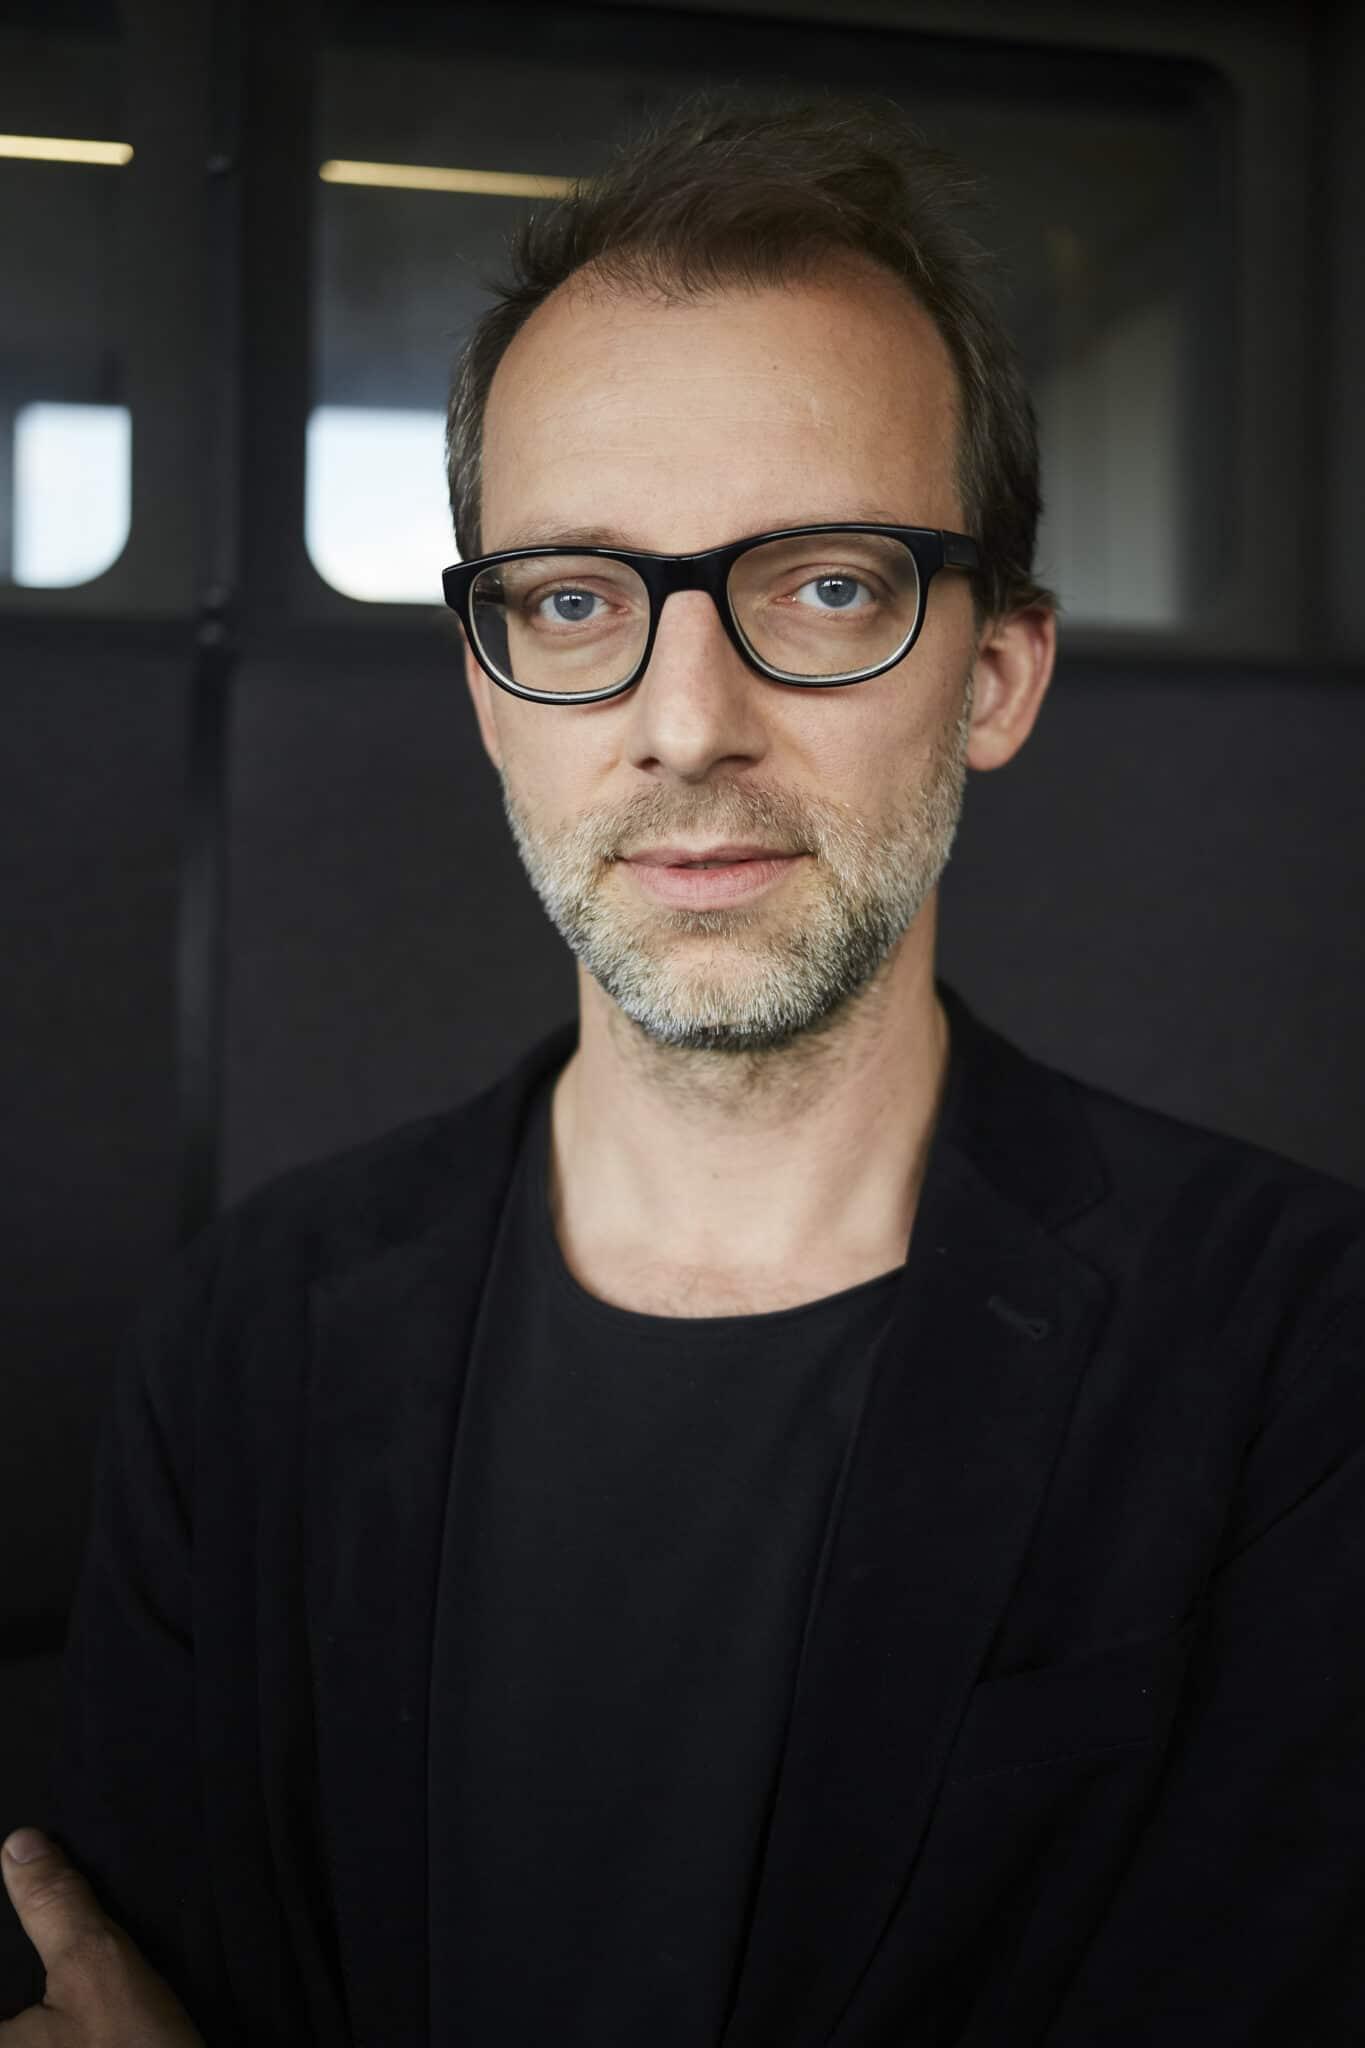 Moritz Preißer Granny